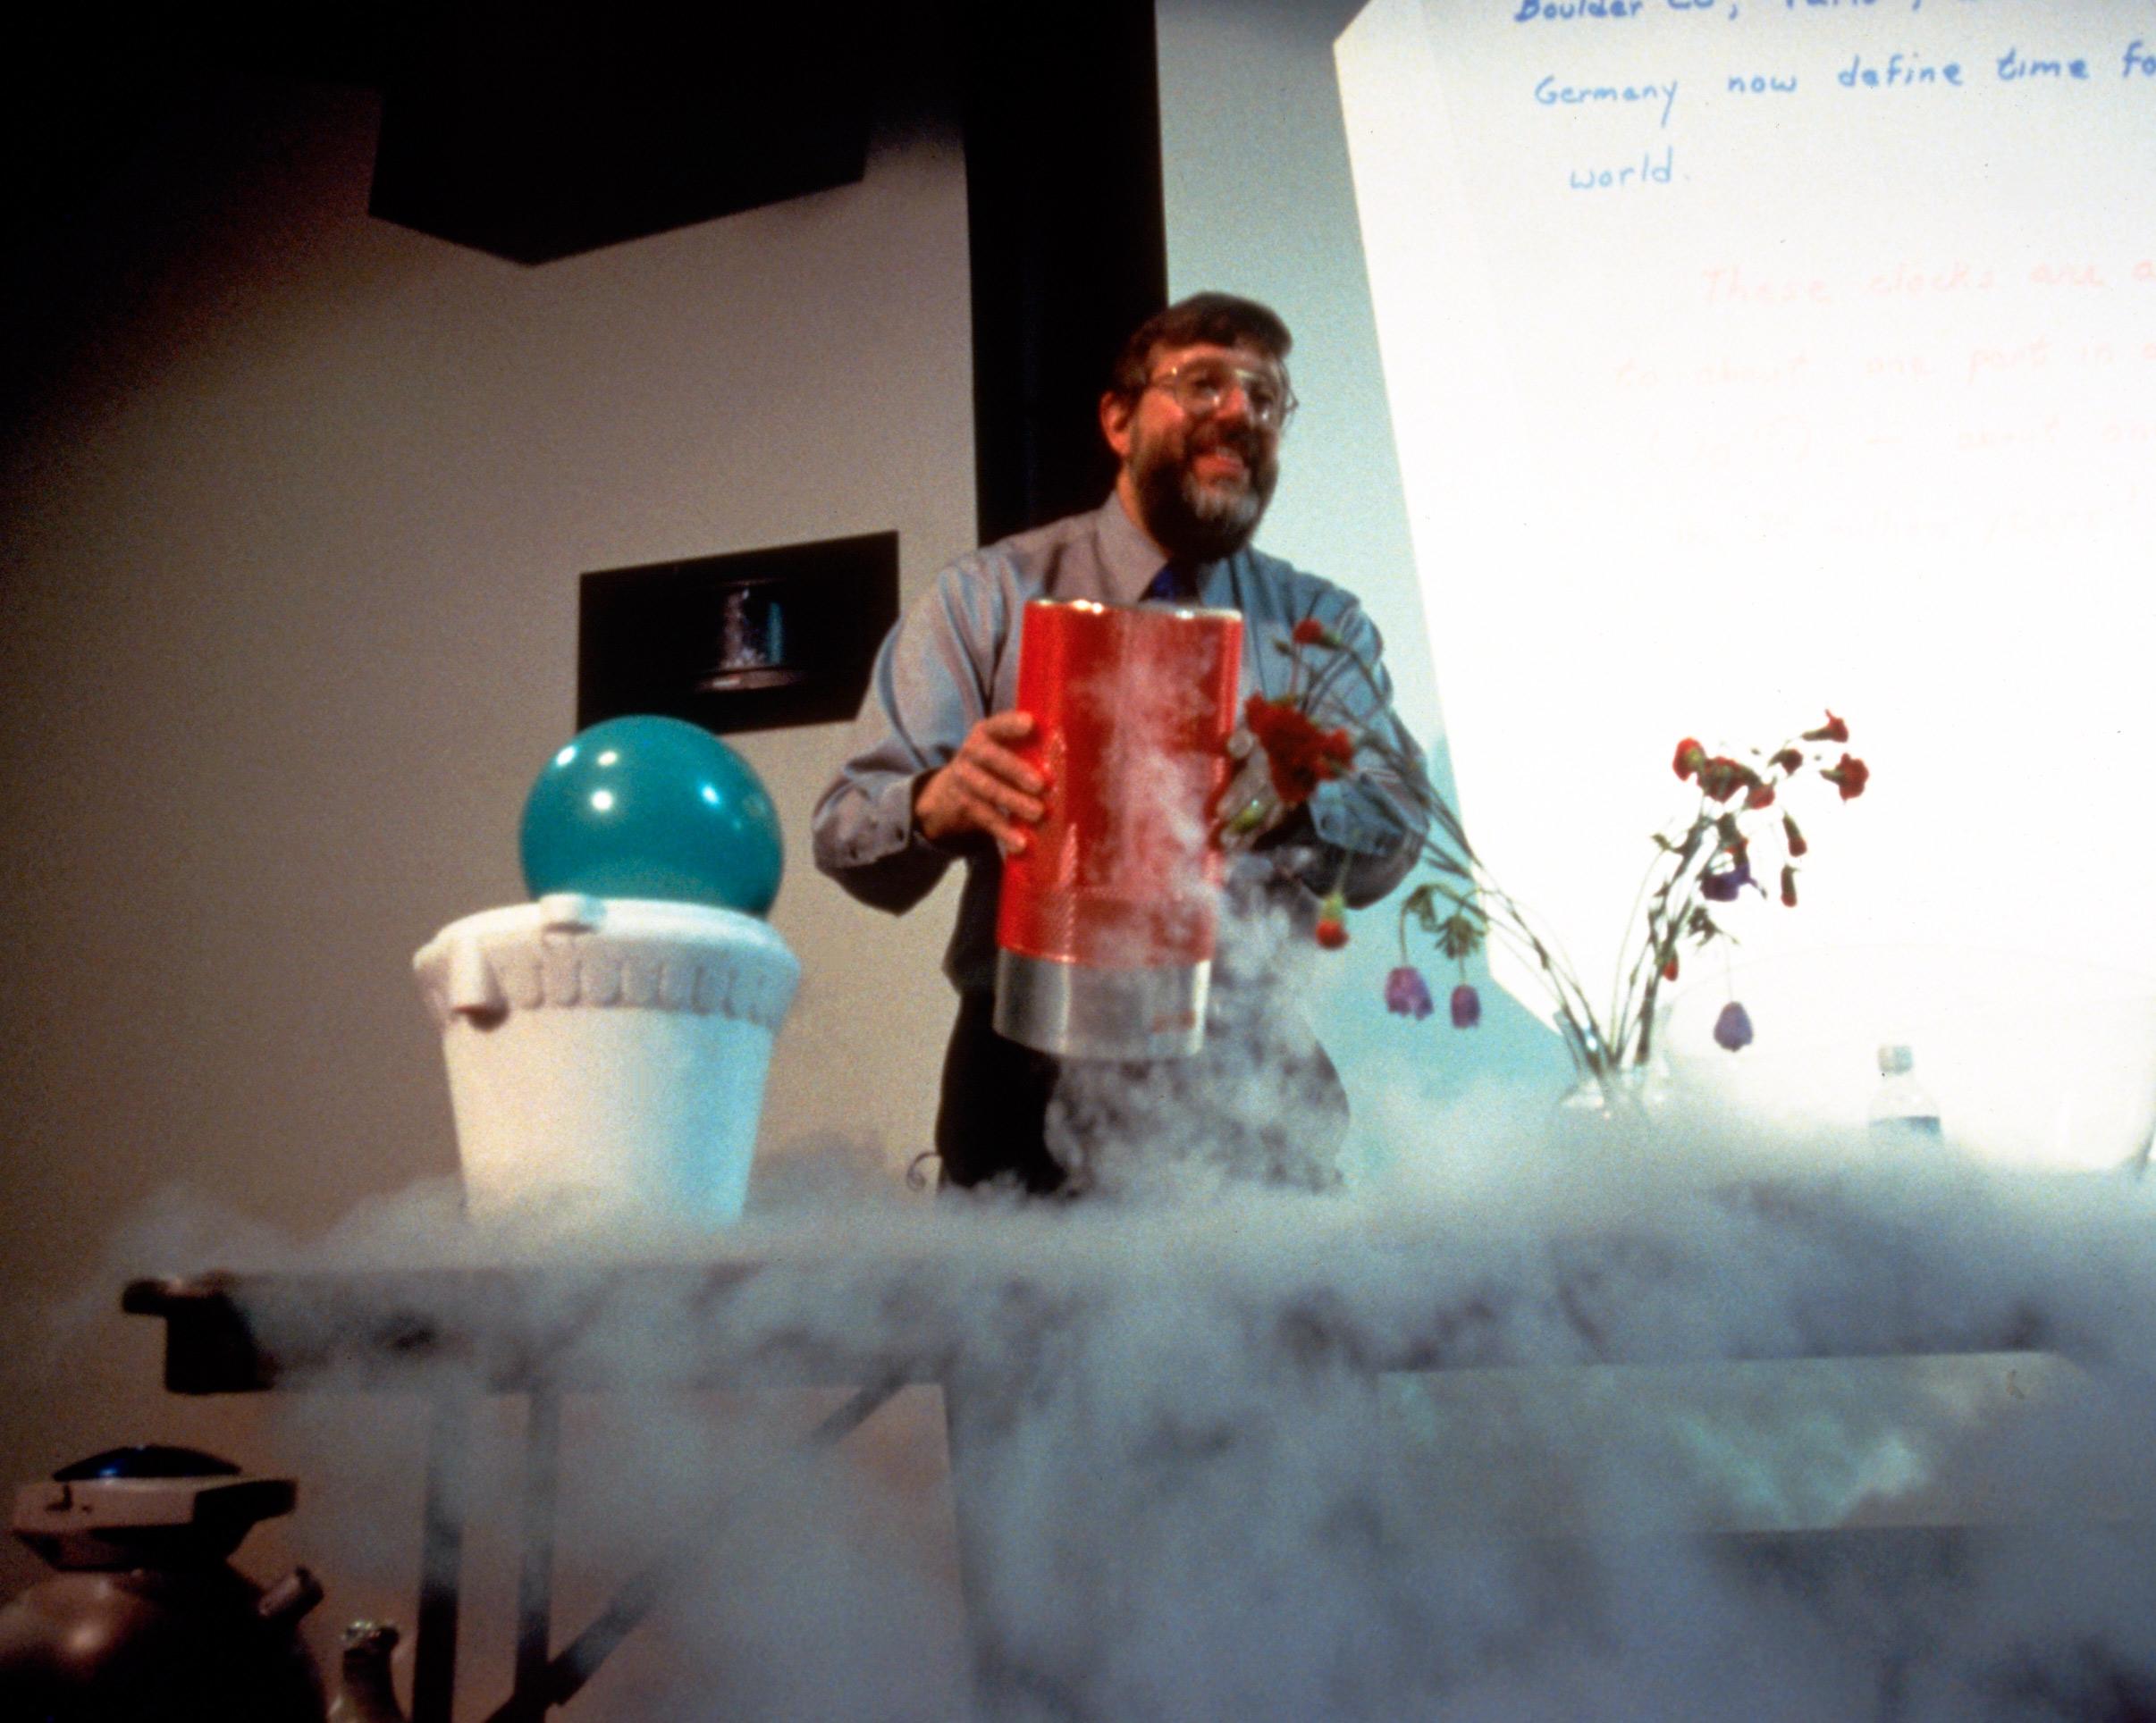 Image of William Phillips with fog from liquid nitrogen